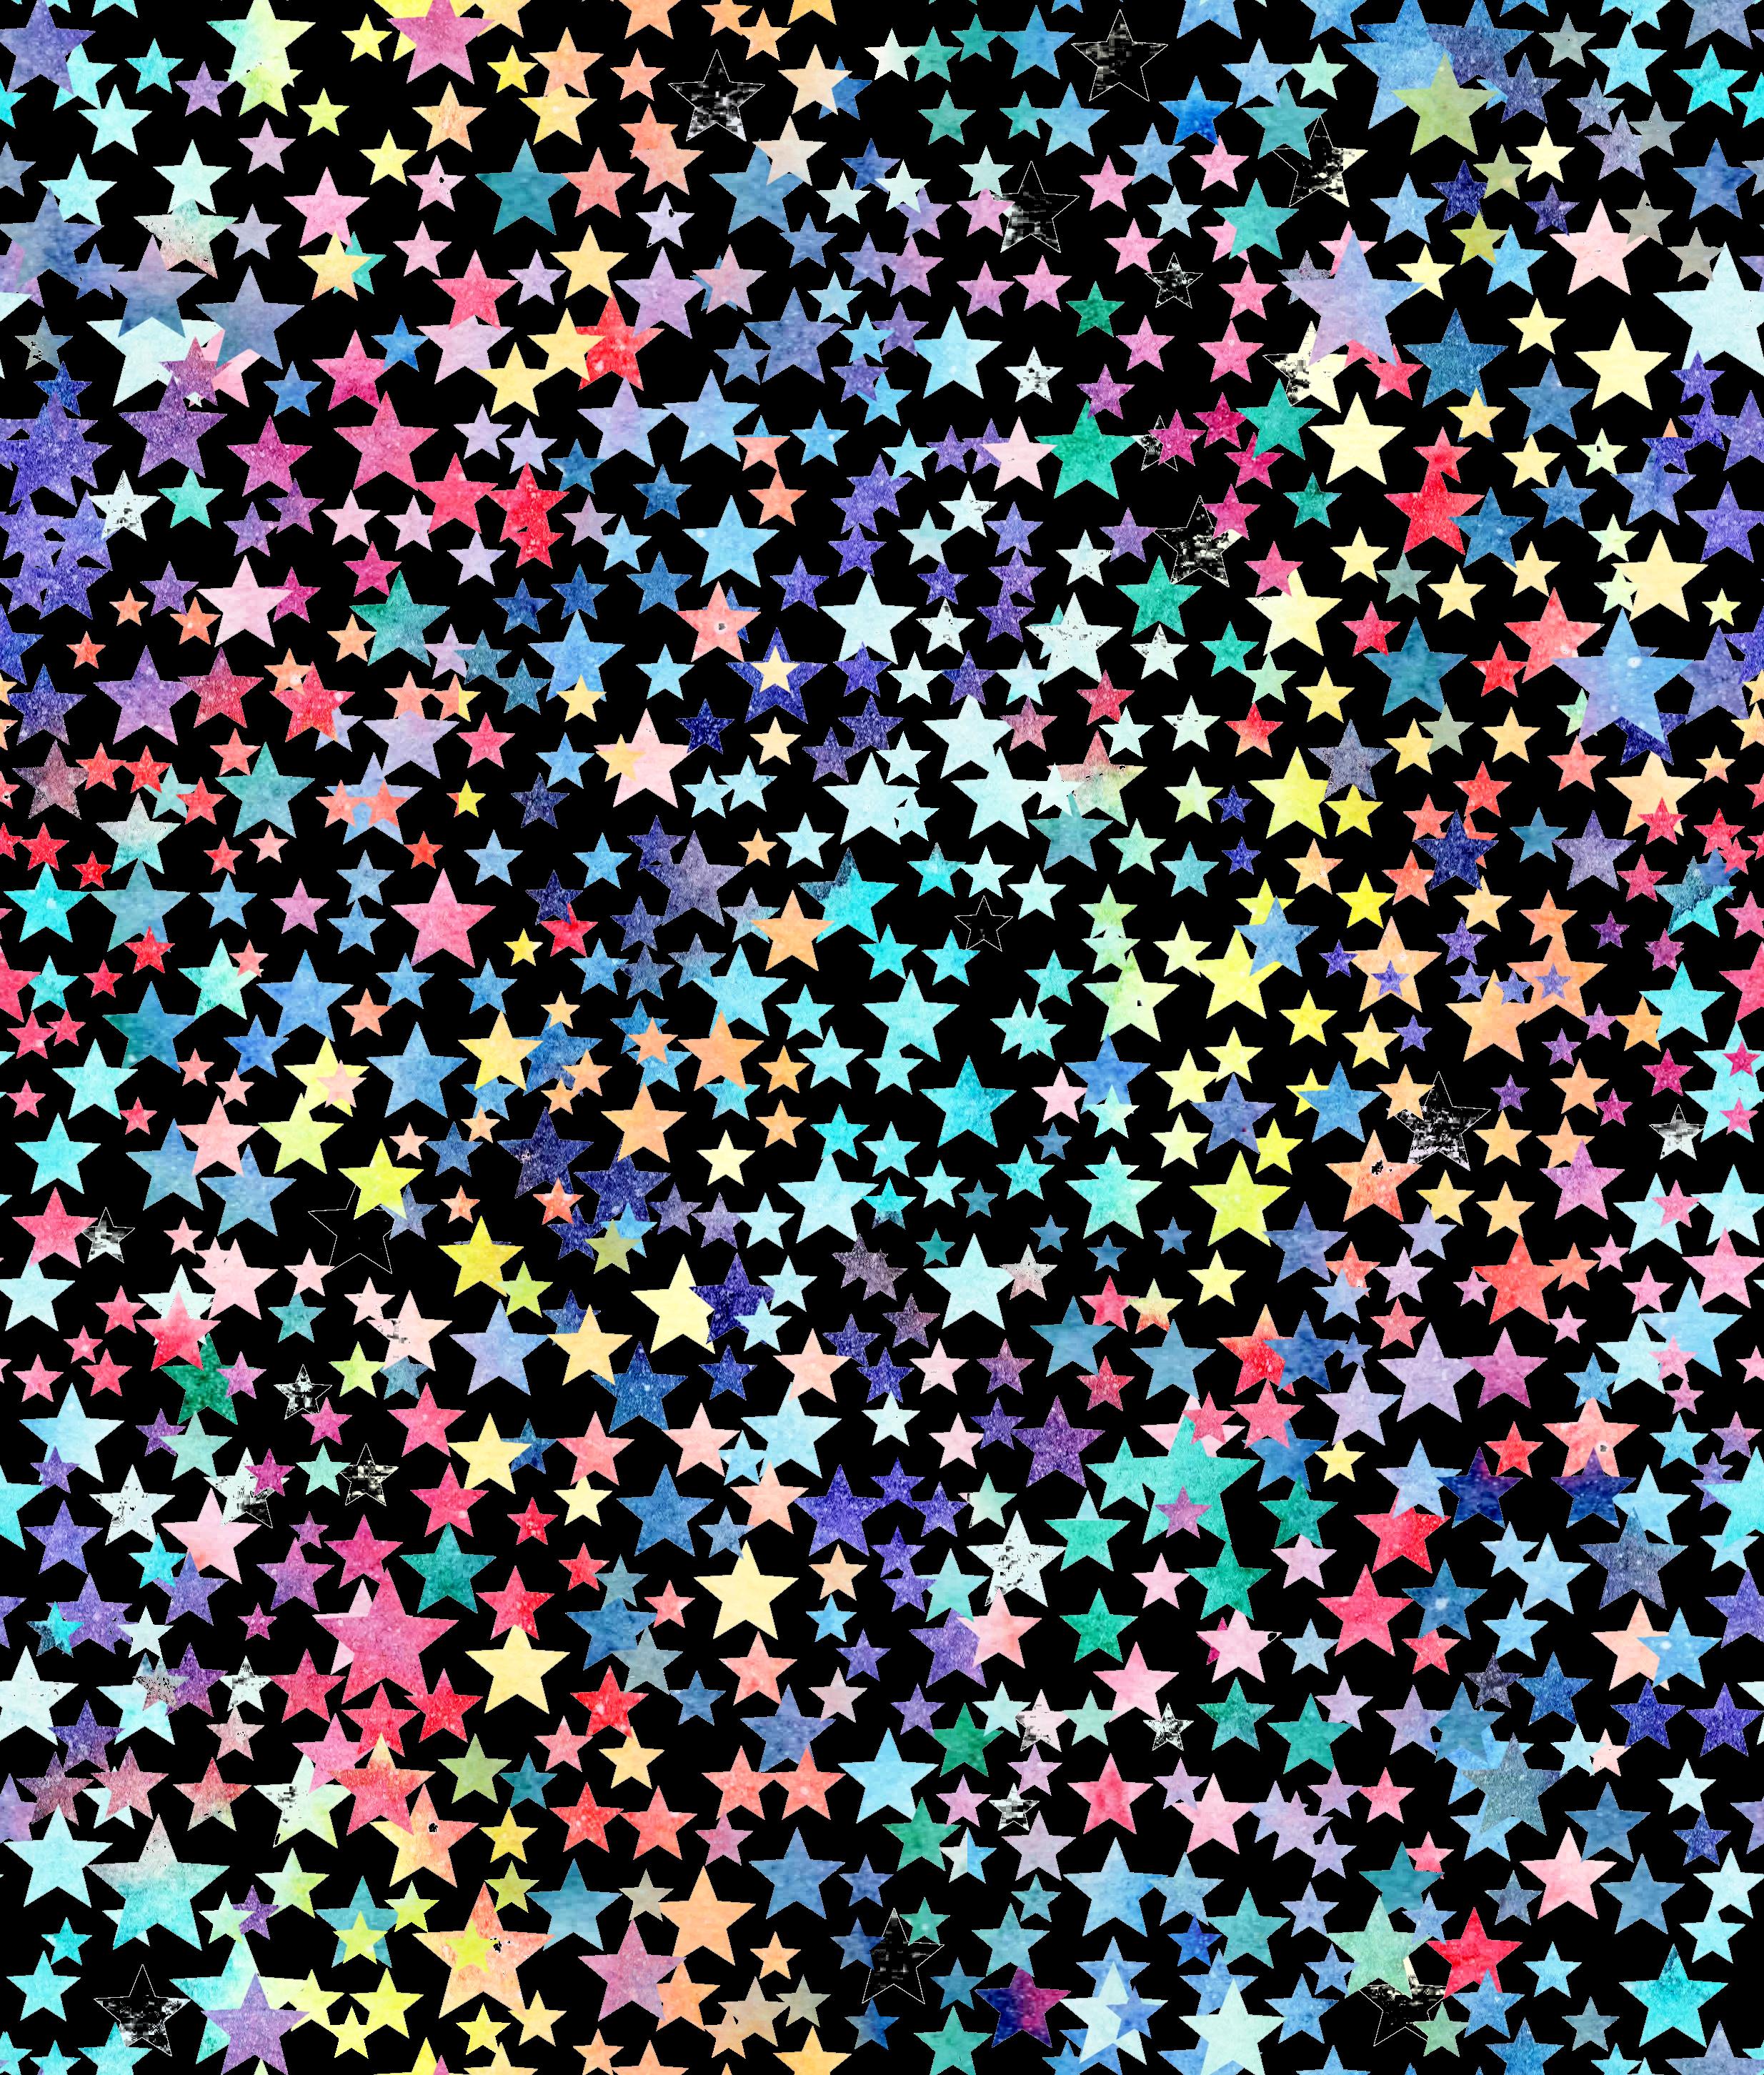 rainbow crowded stars blacj.jpg